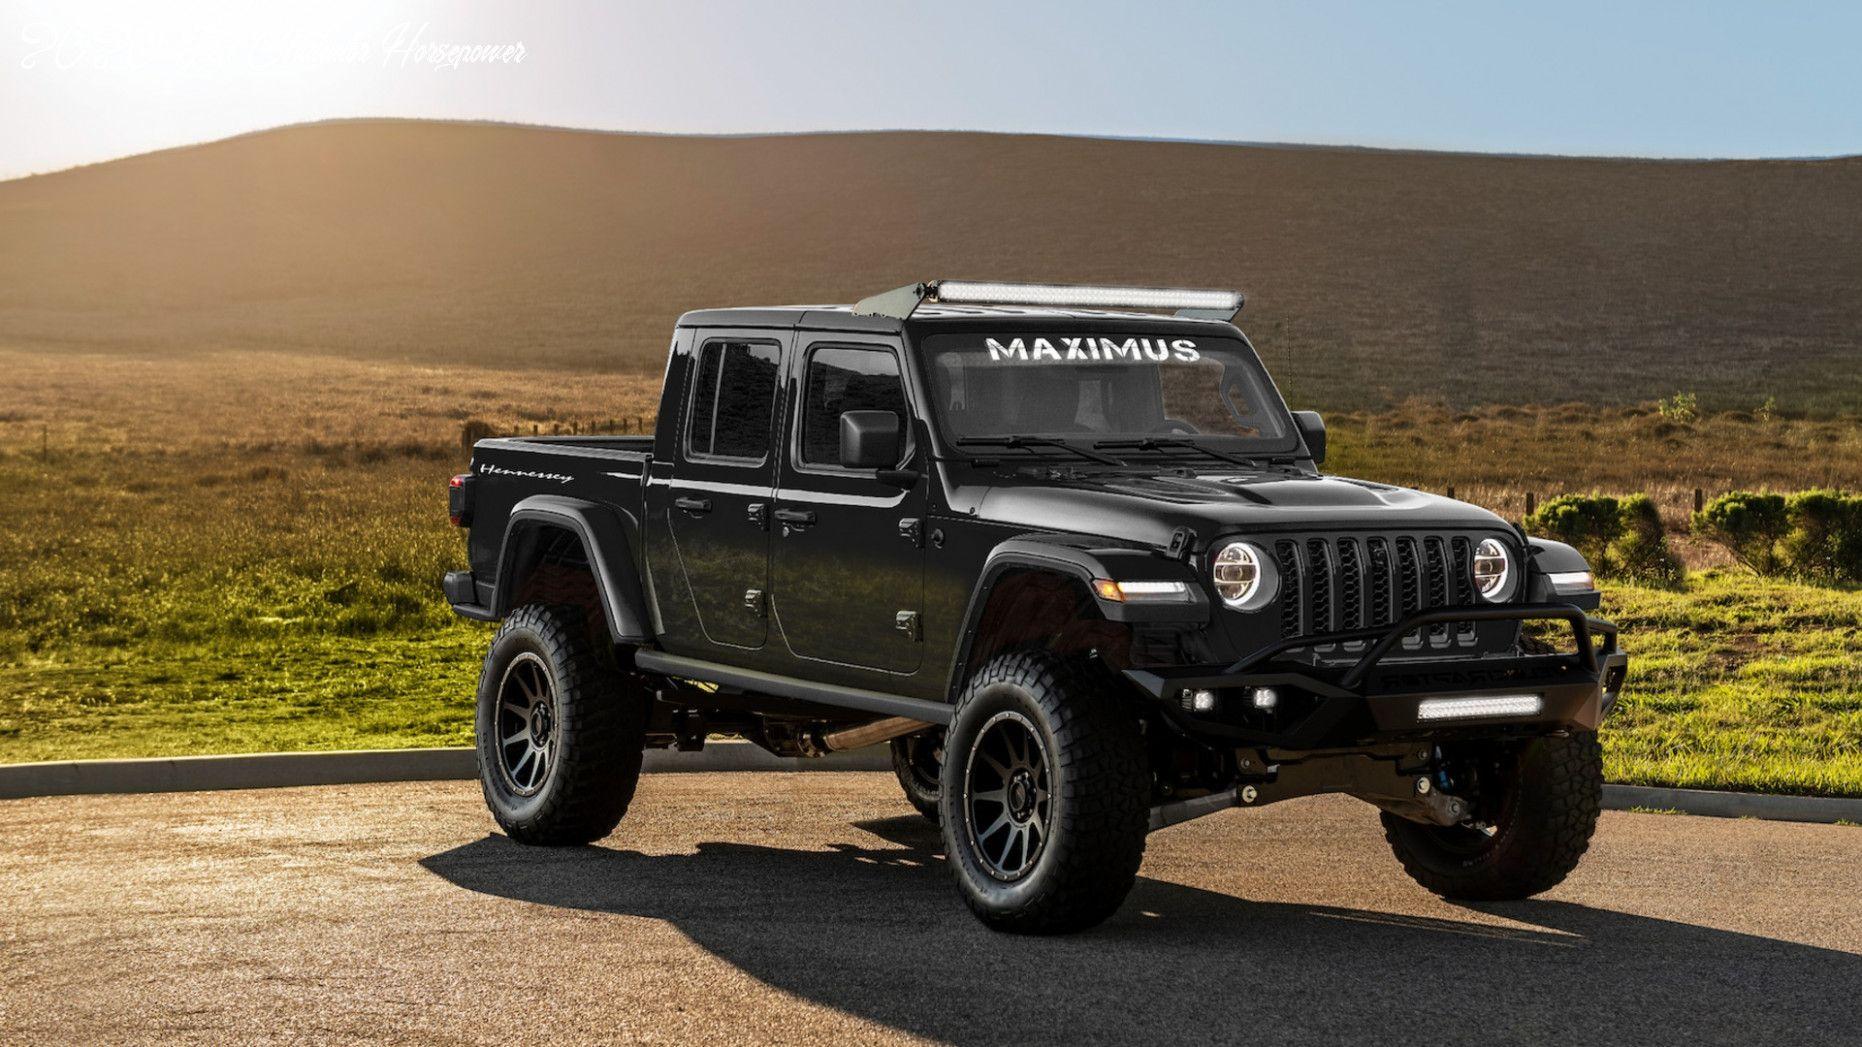 2020 Jeep Gladiator Horsepower Interior In 2020 Jeep Gladiator Jeep Gladiator